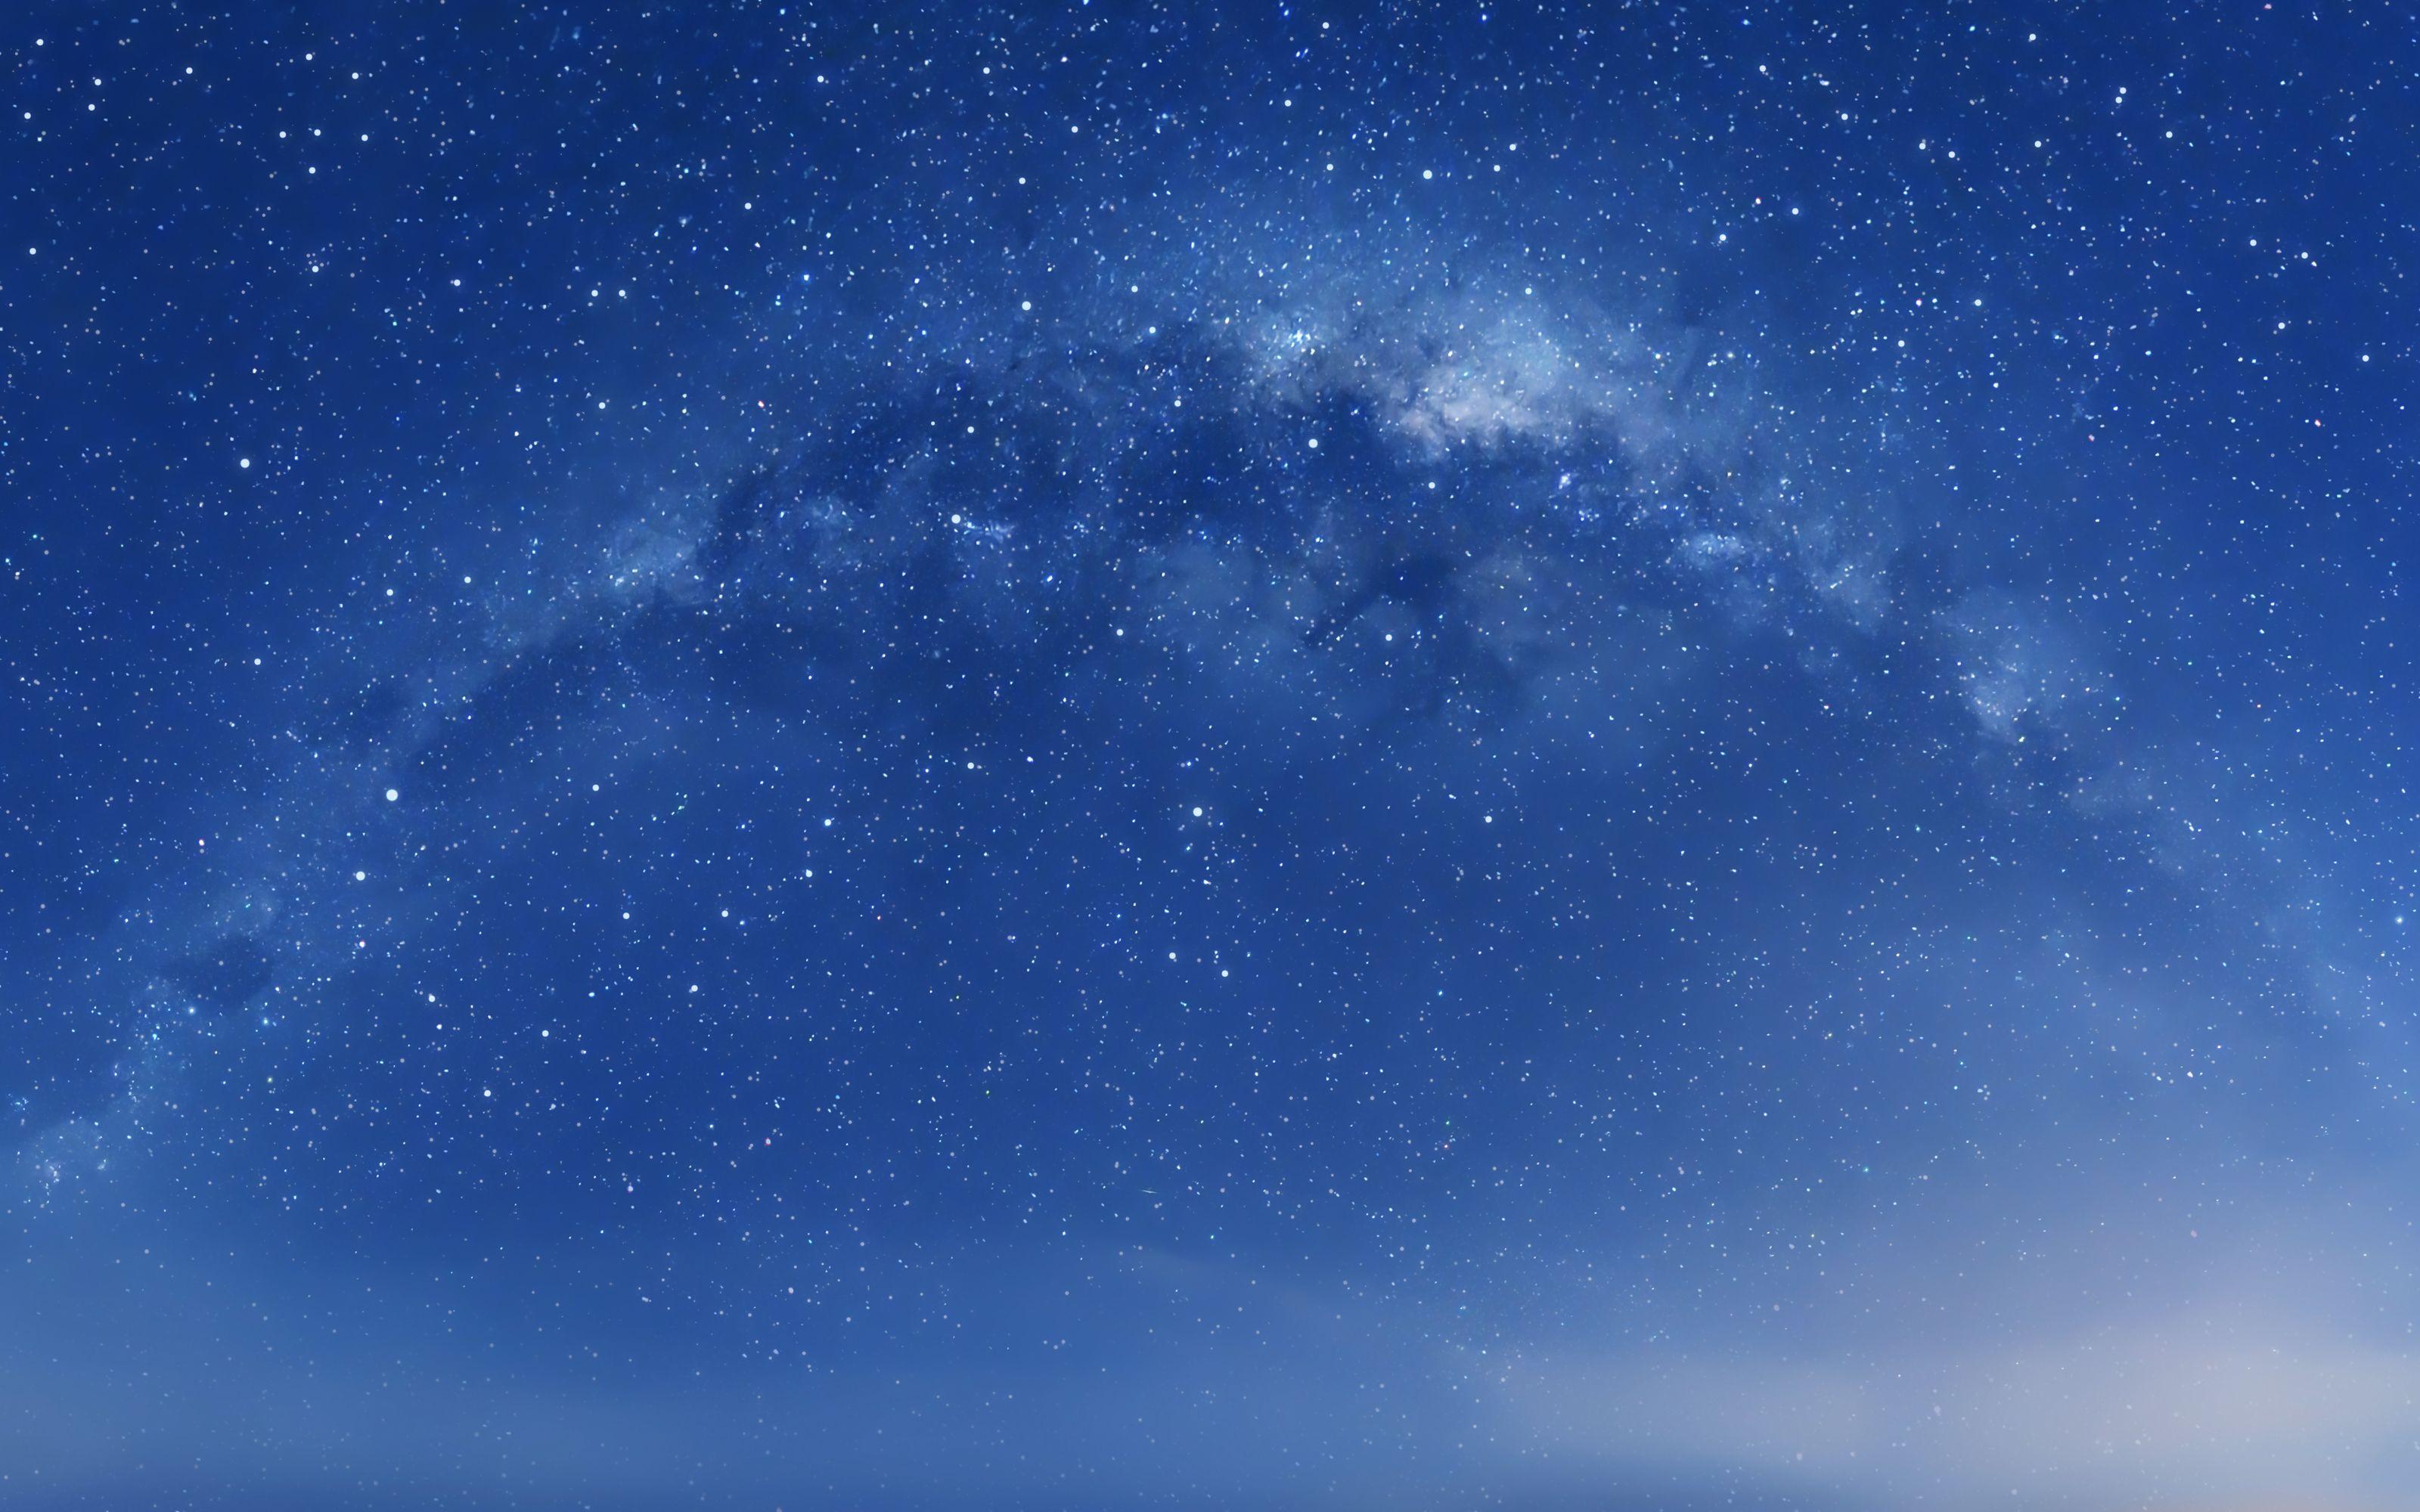 Milky Way Mac Wallpaper Ios Wallpapers Android Wallpaper